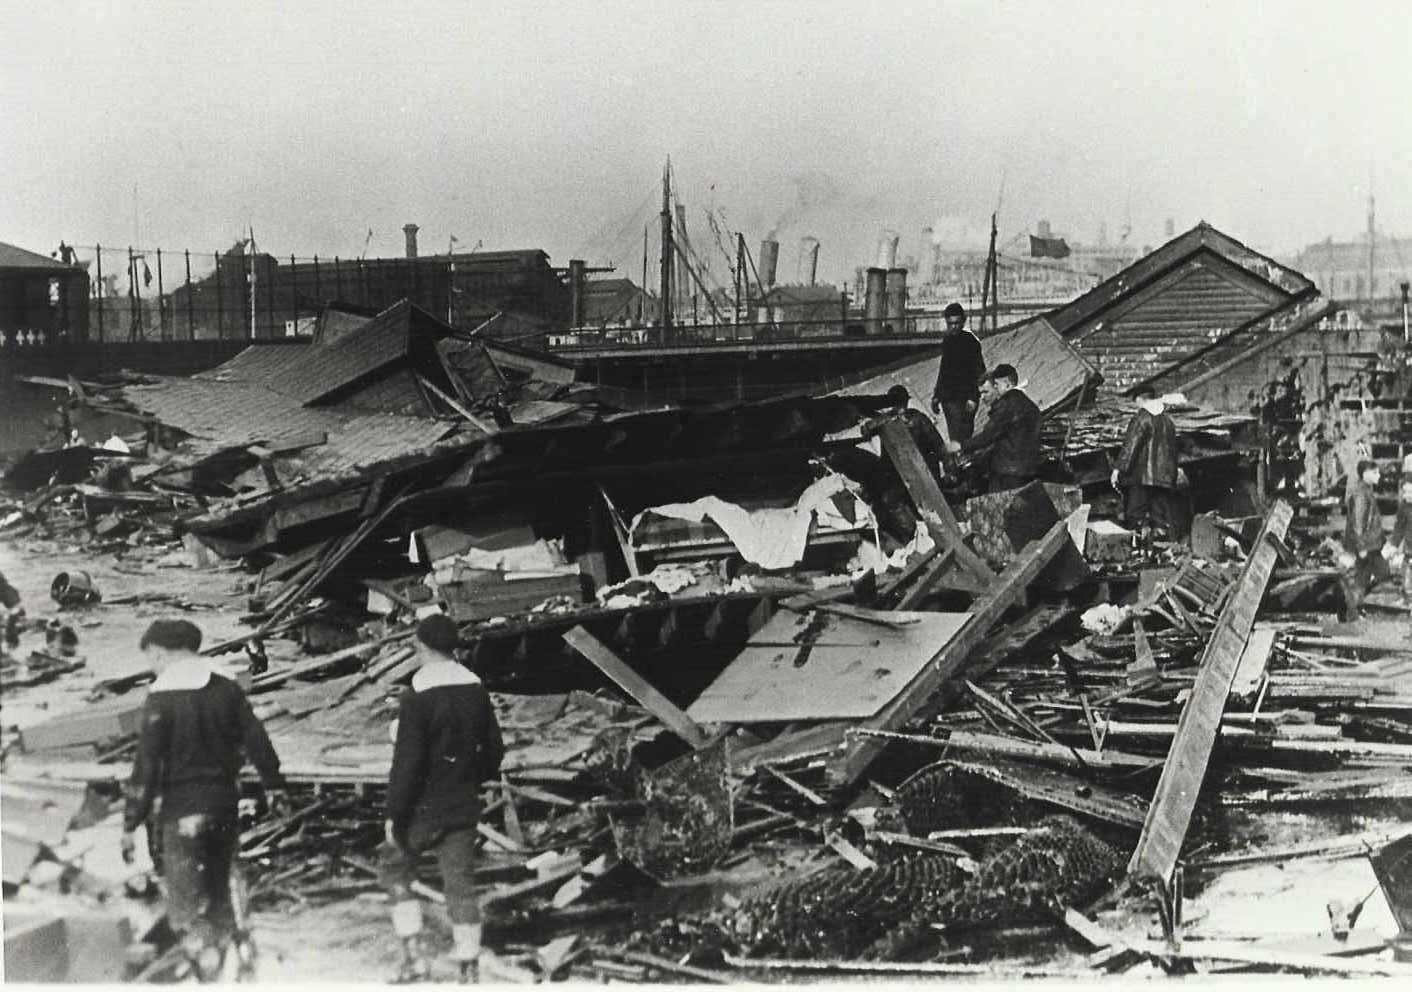 Boston Molasses Flood - house destroyed